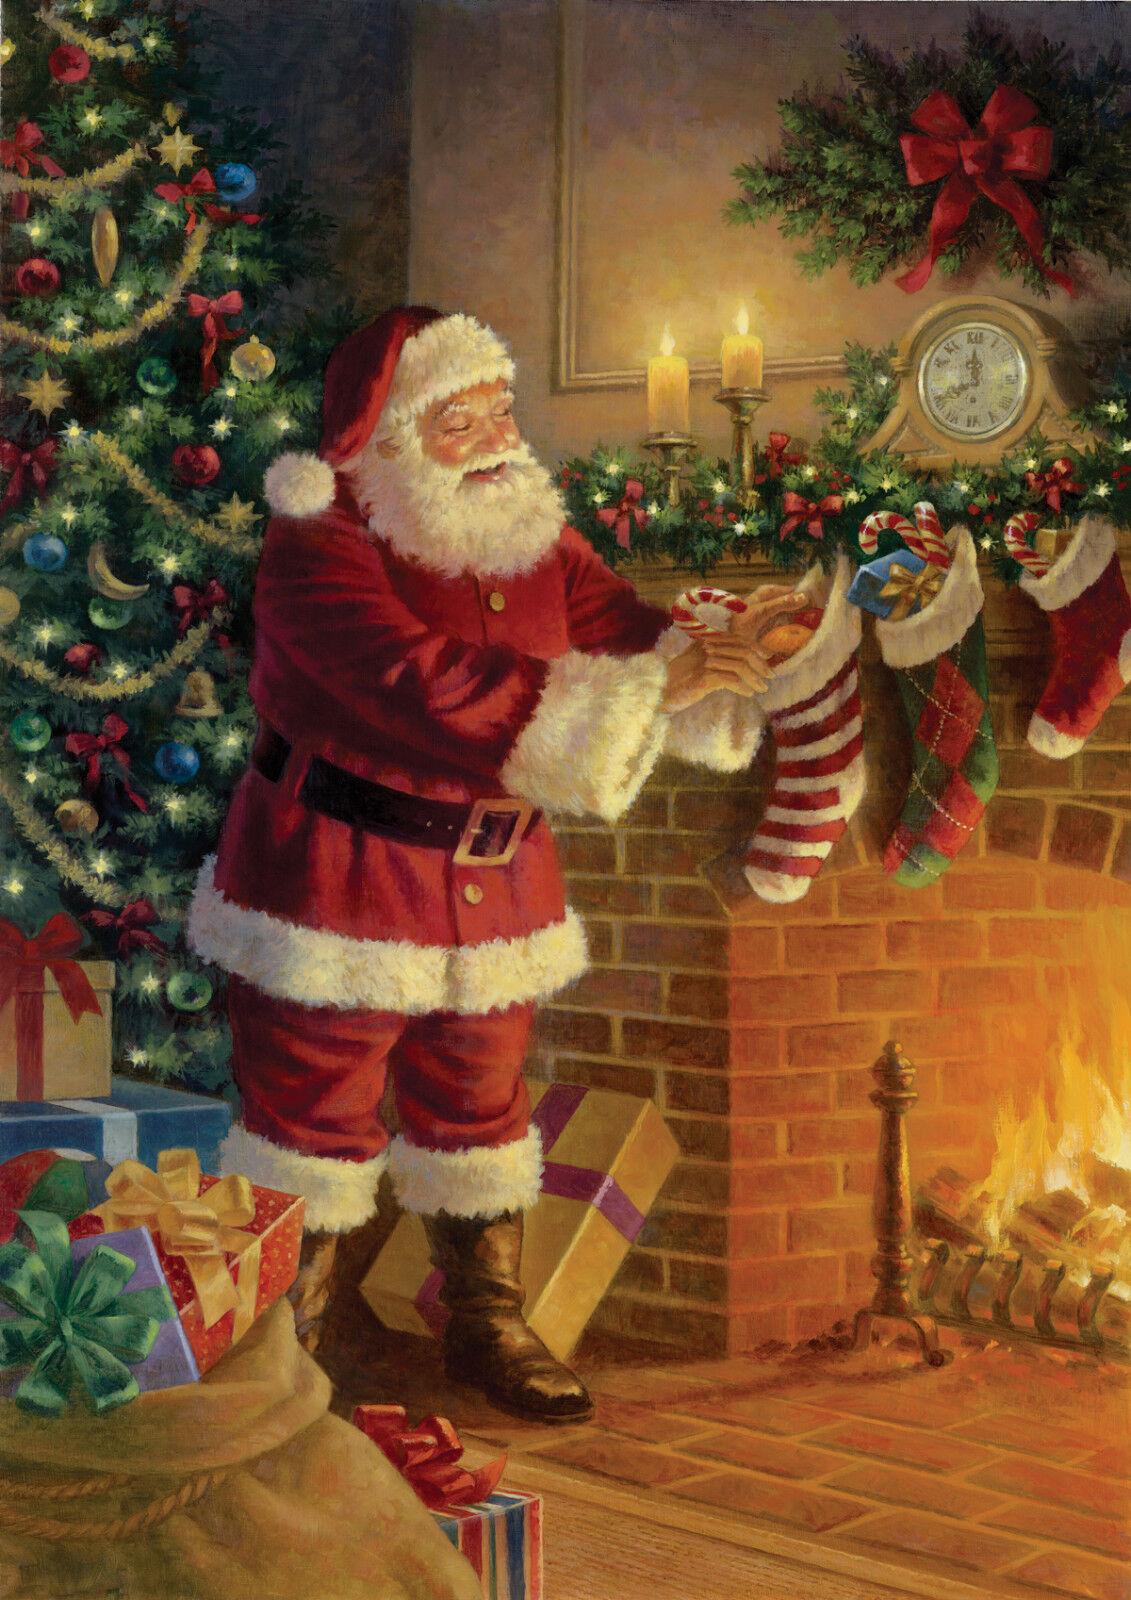 Stocking Stuffer Garden Flag Christmas Santa Claus Fireplace Toland ...